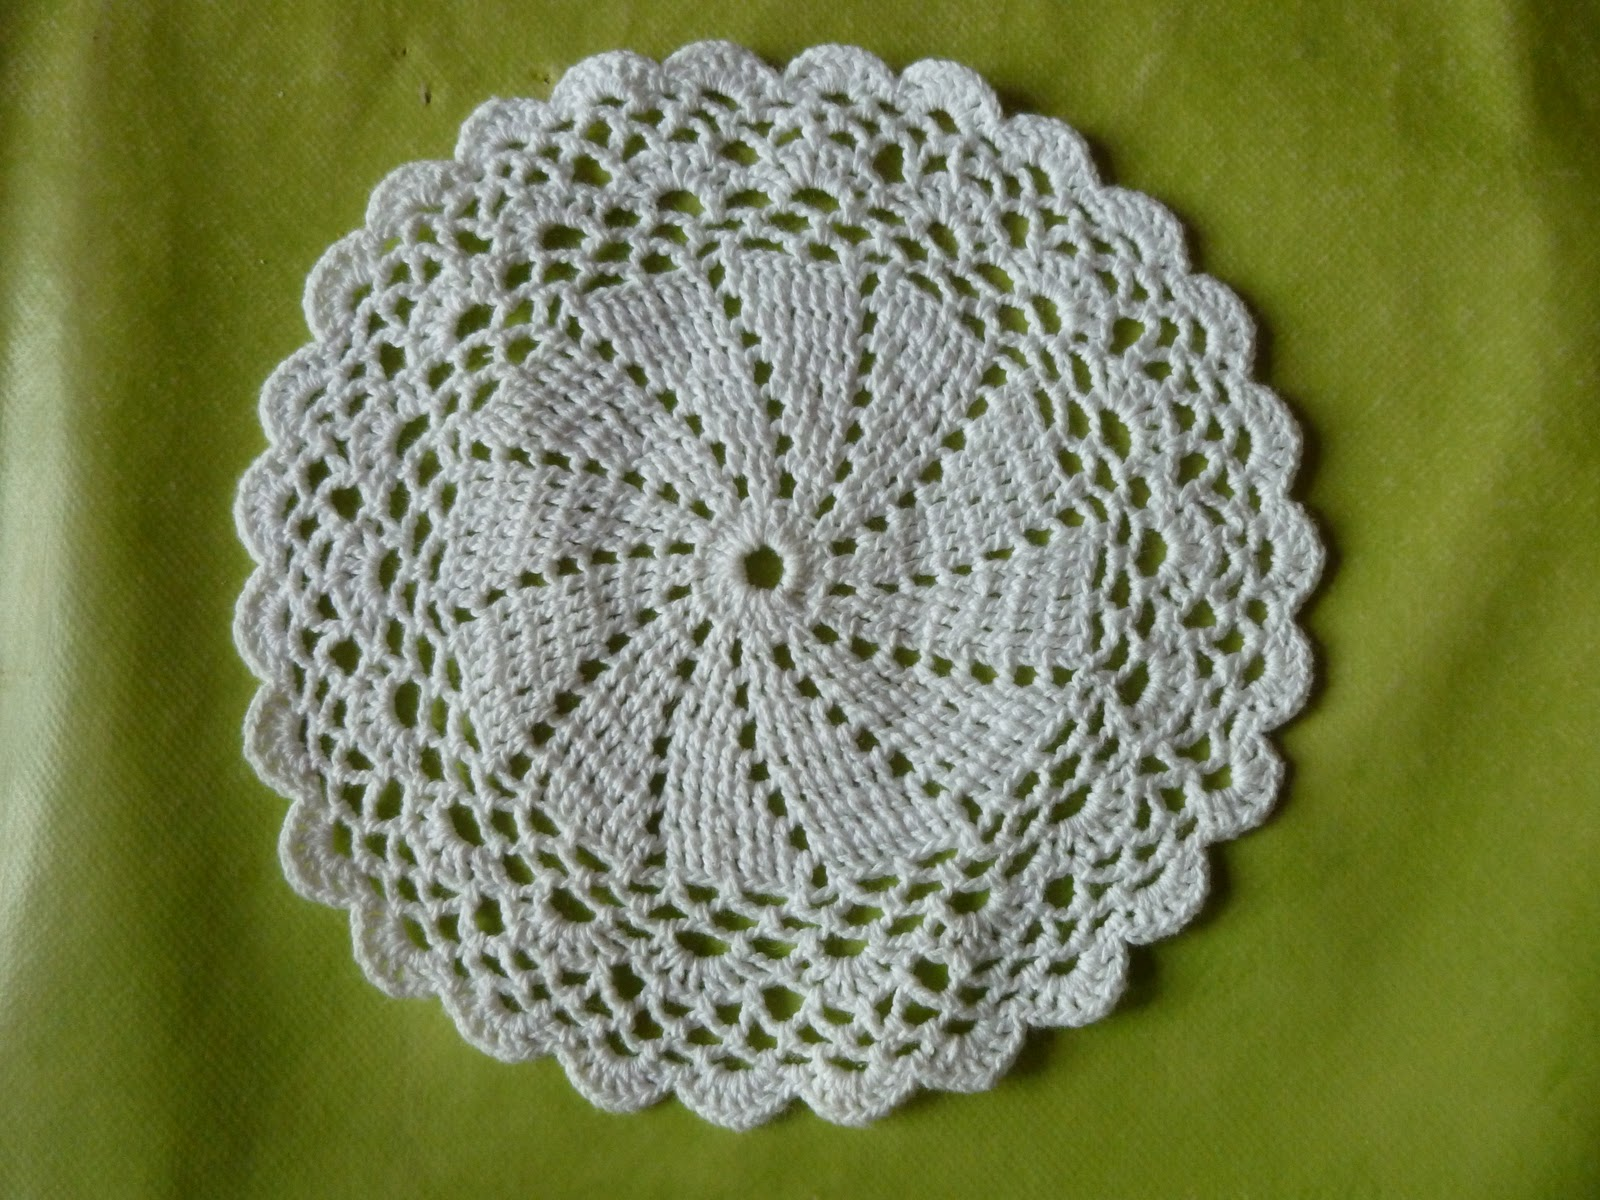 longchamp bricole napperon crochet facile. Black Bedroom Furniture Sets. Home Design Ideas